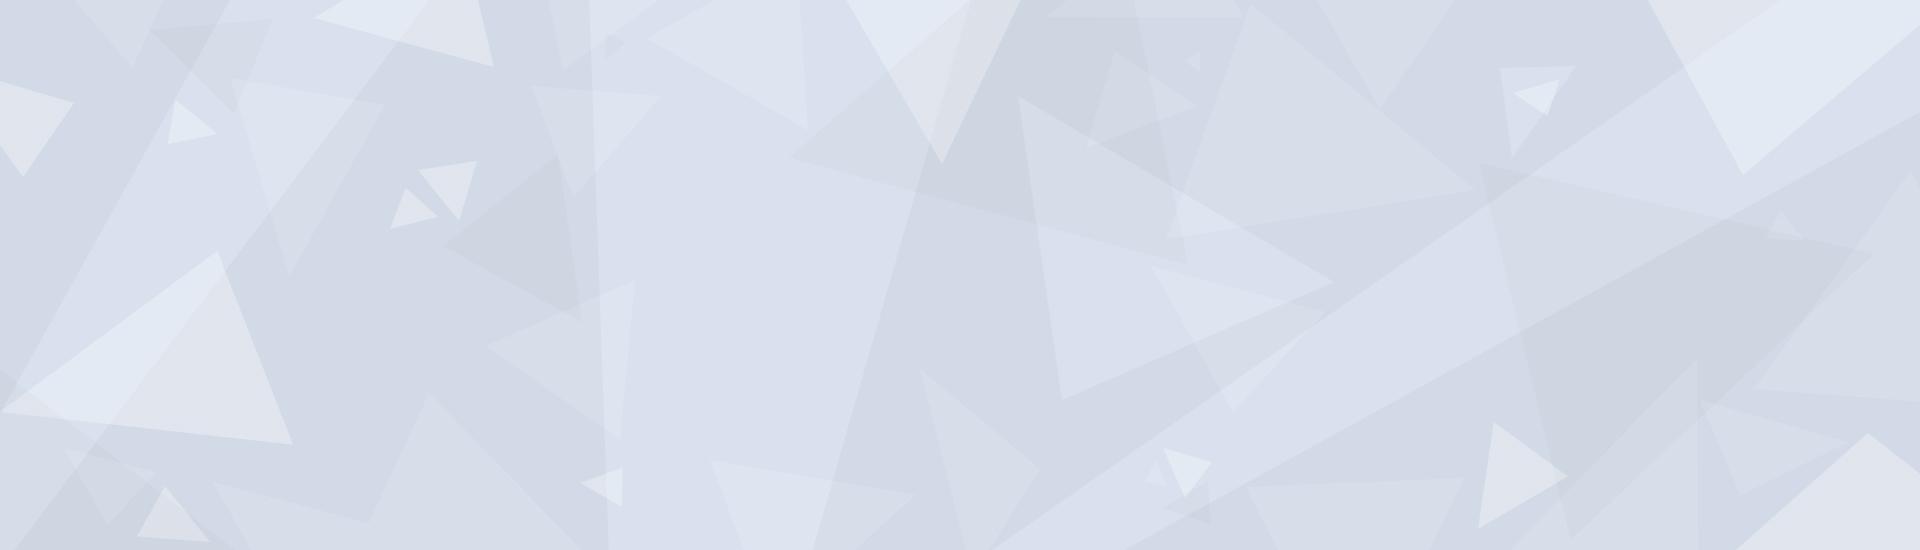 Luxen - VSLeague Online eSport